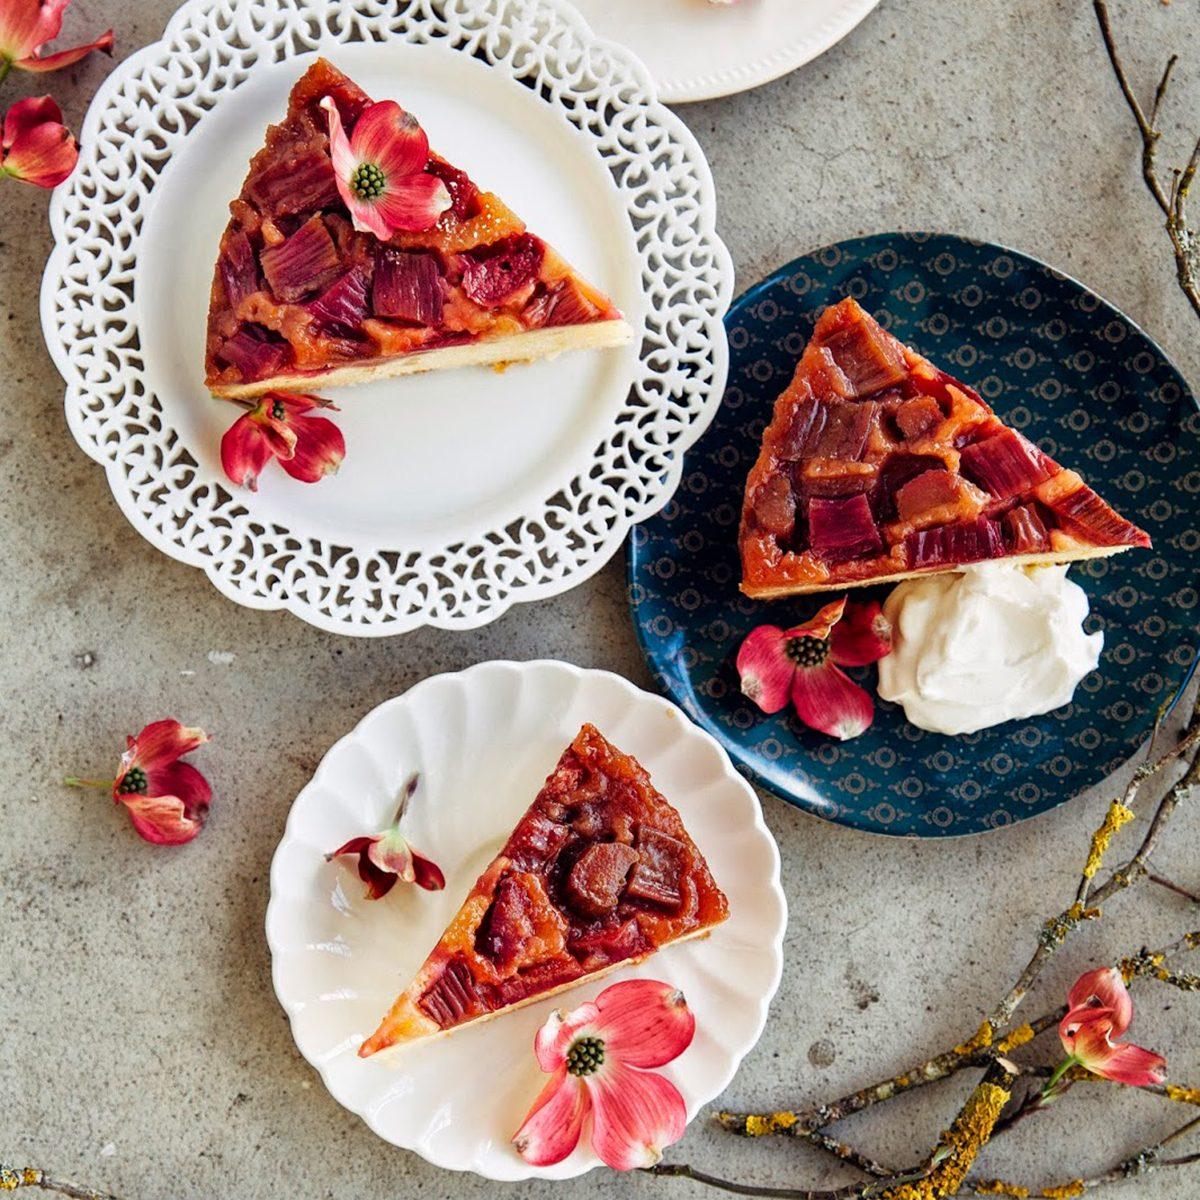 Rhubarb and Marzipan Upside Down Cake